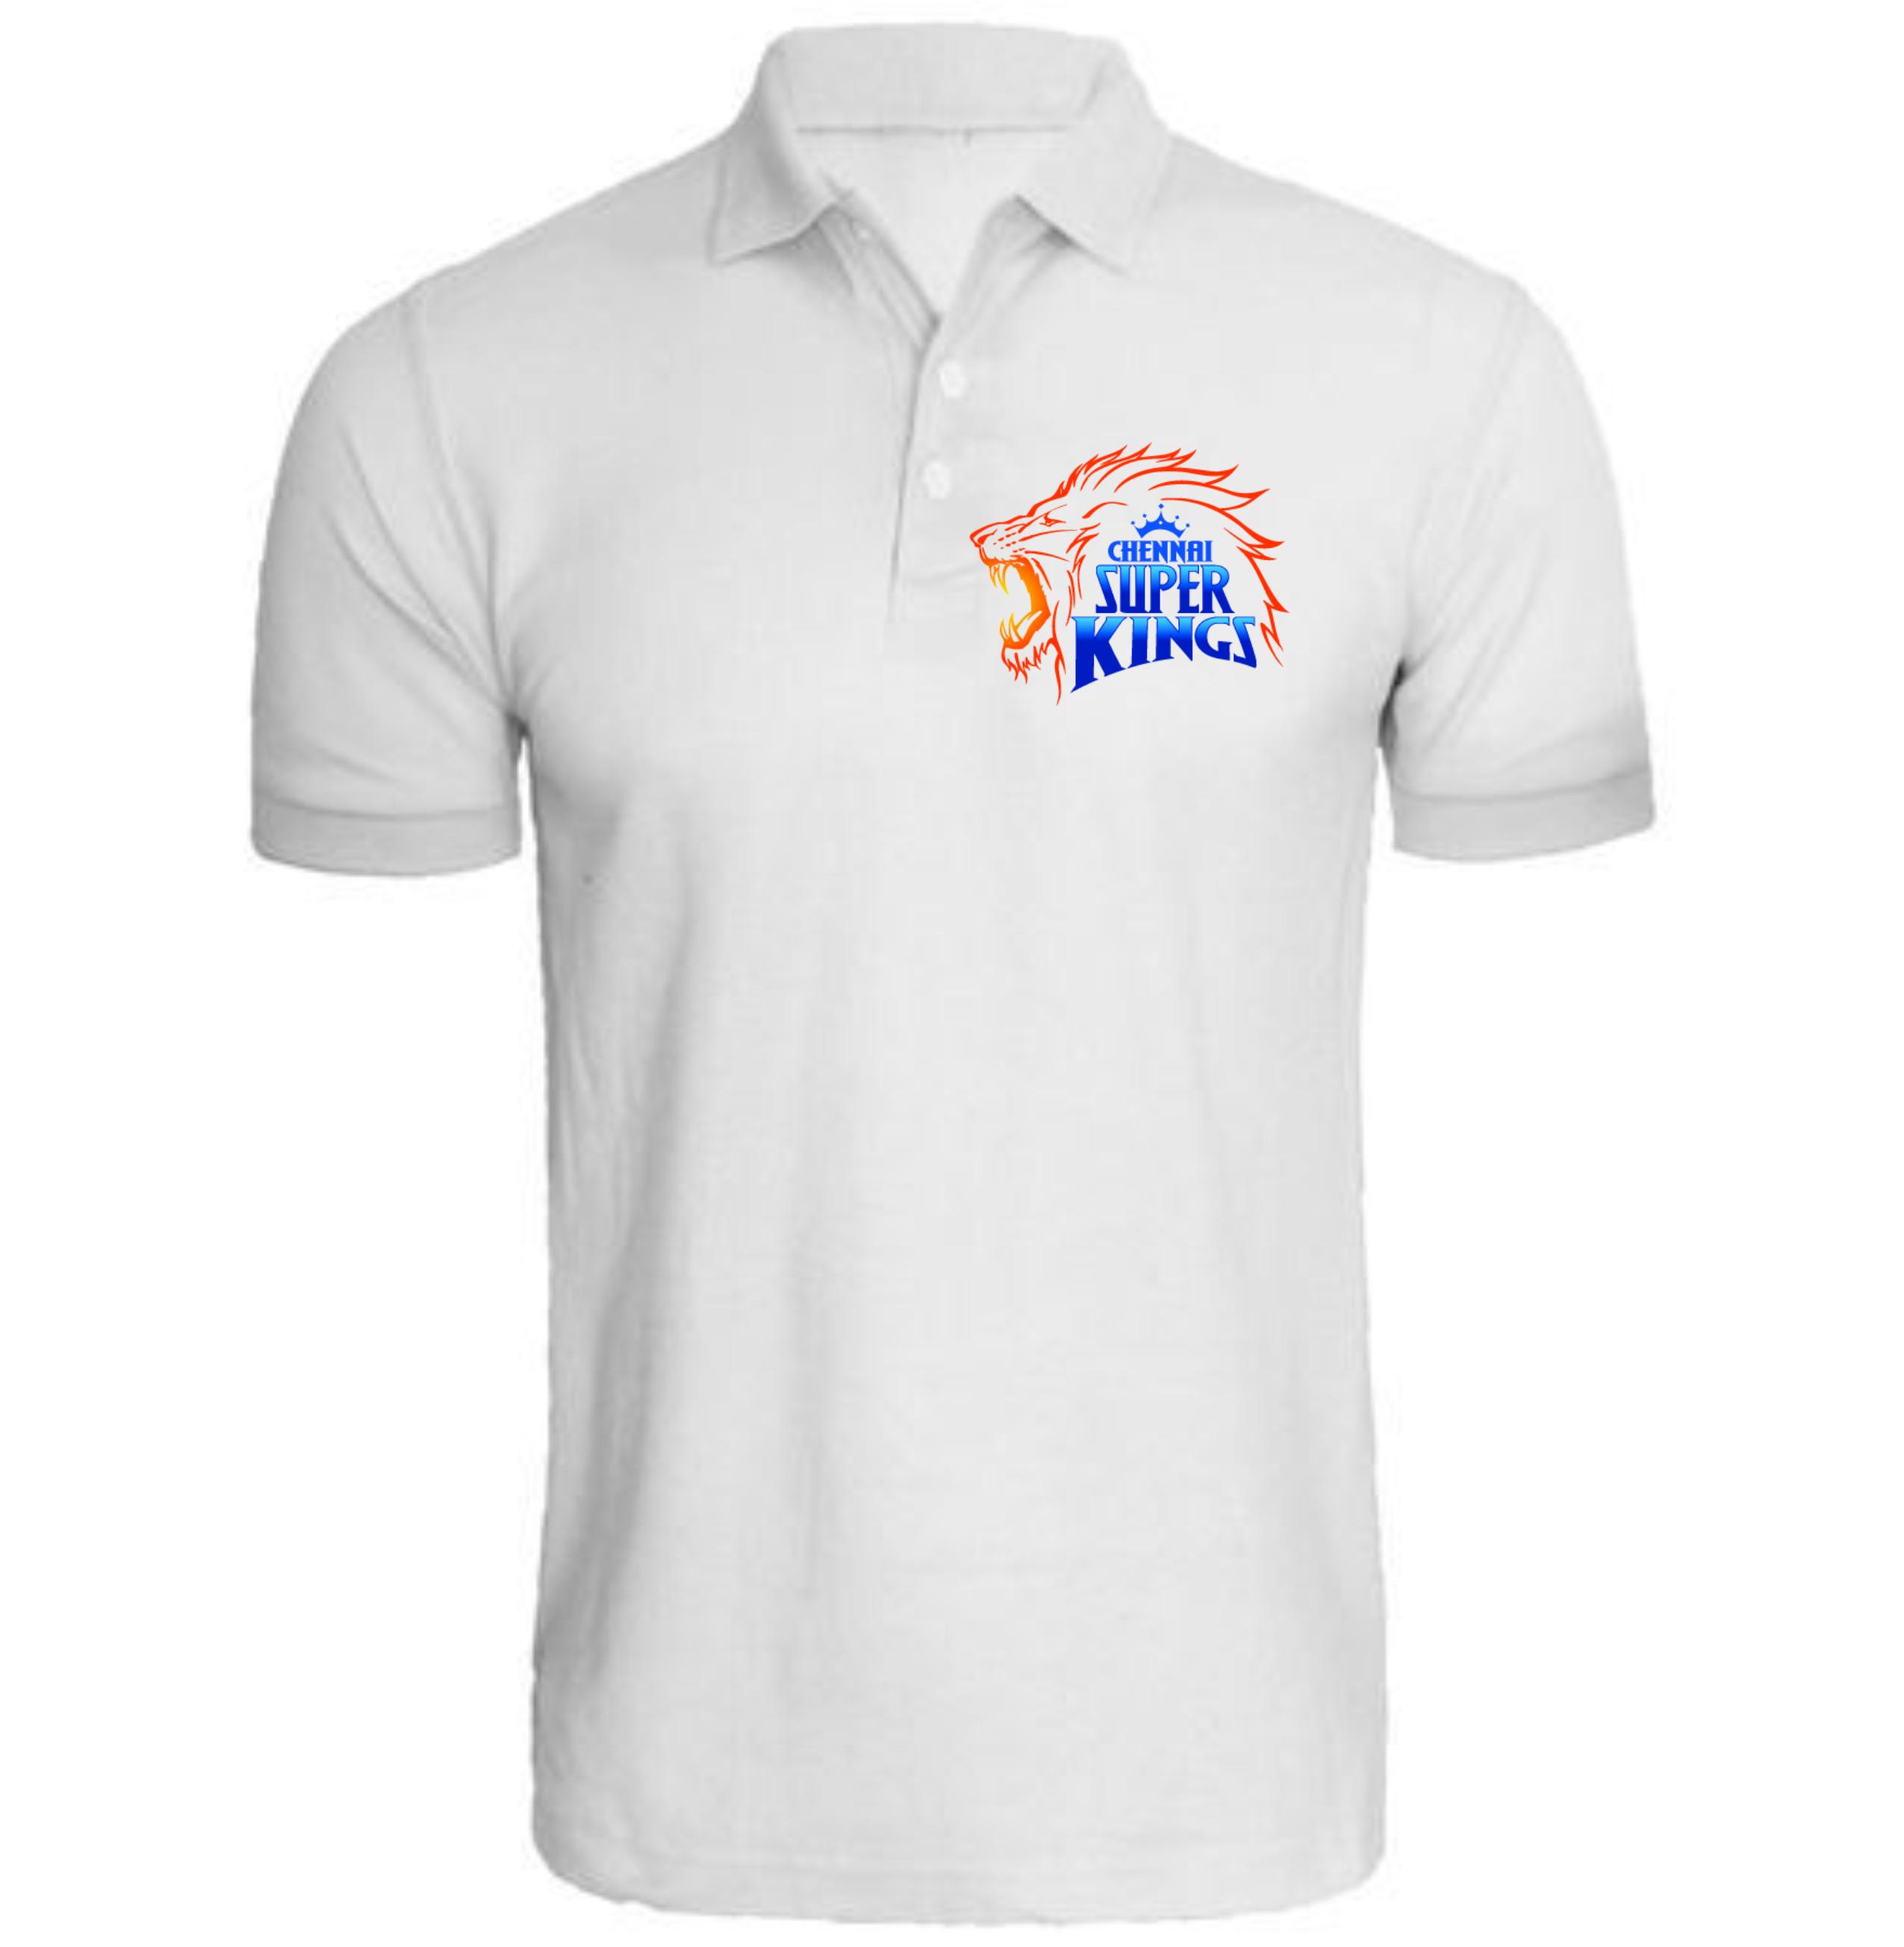 IPL T-shirts